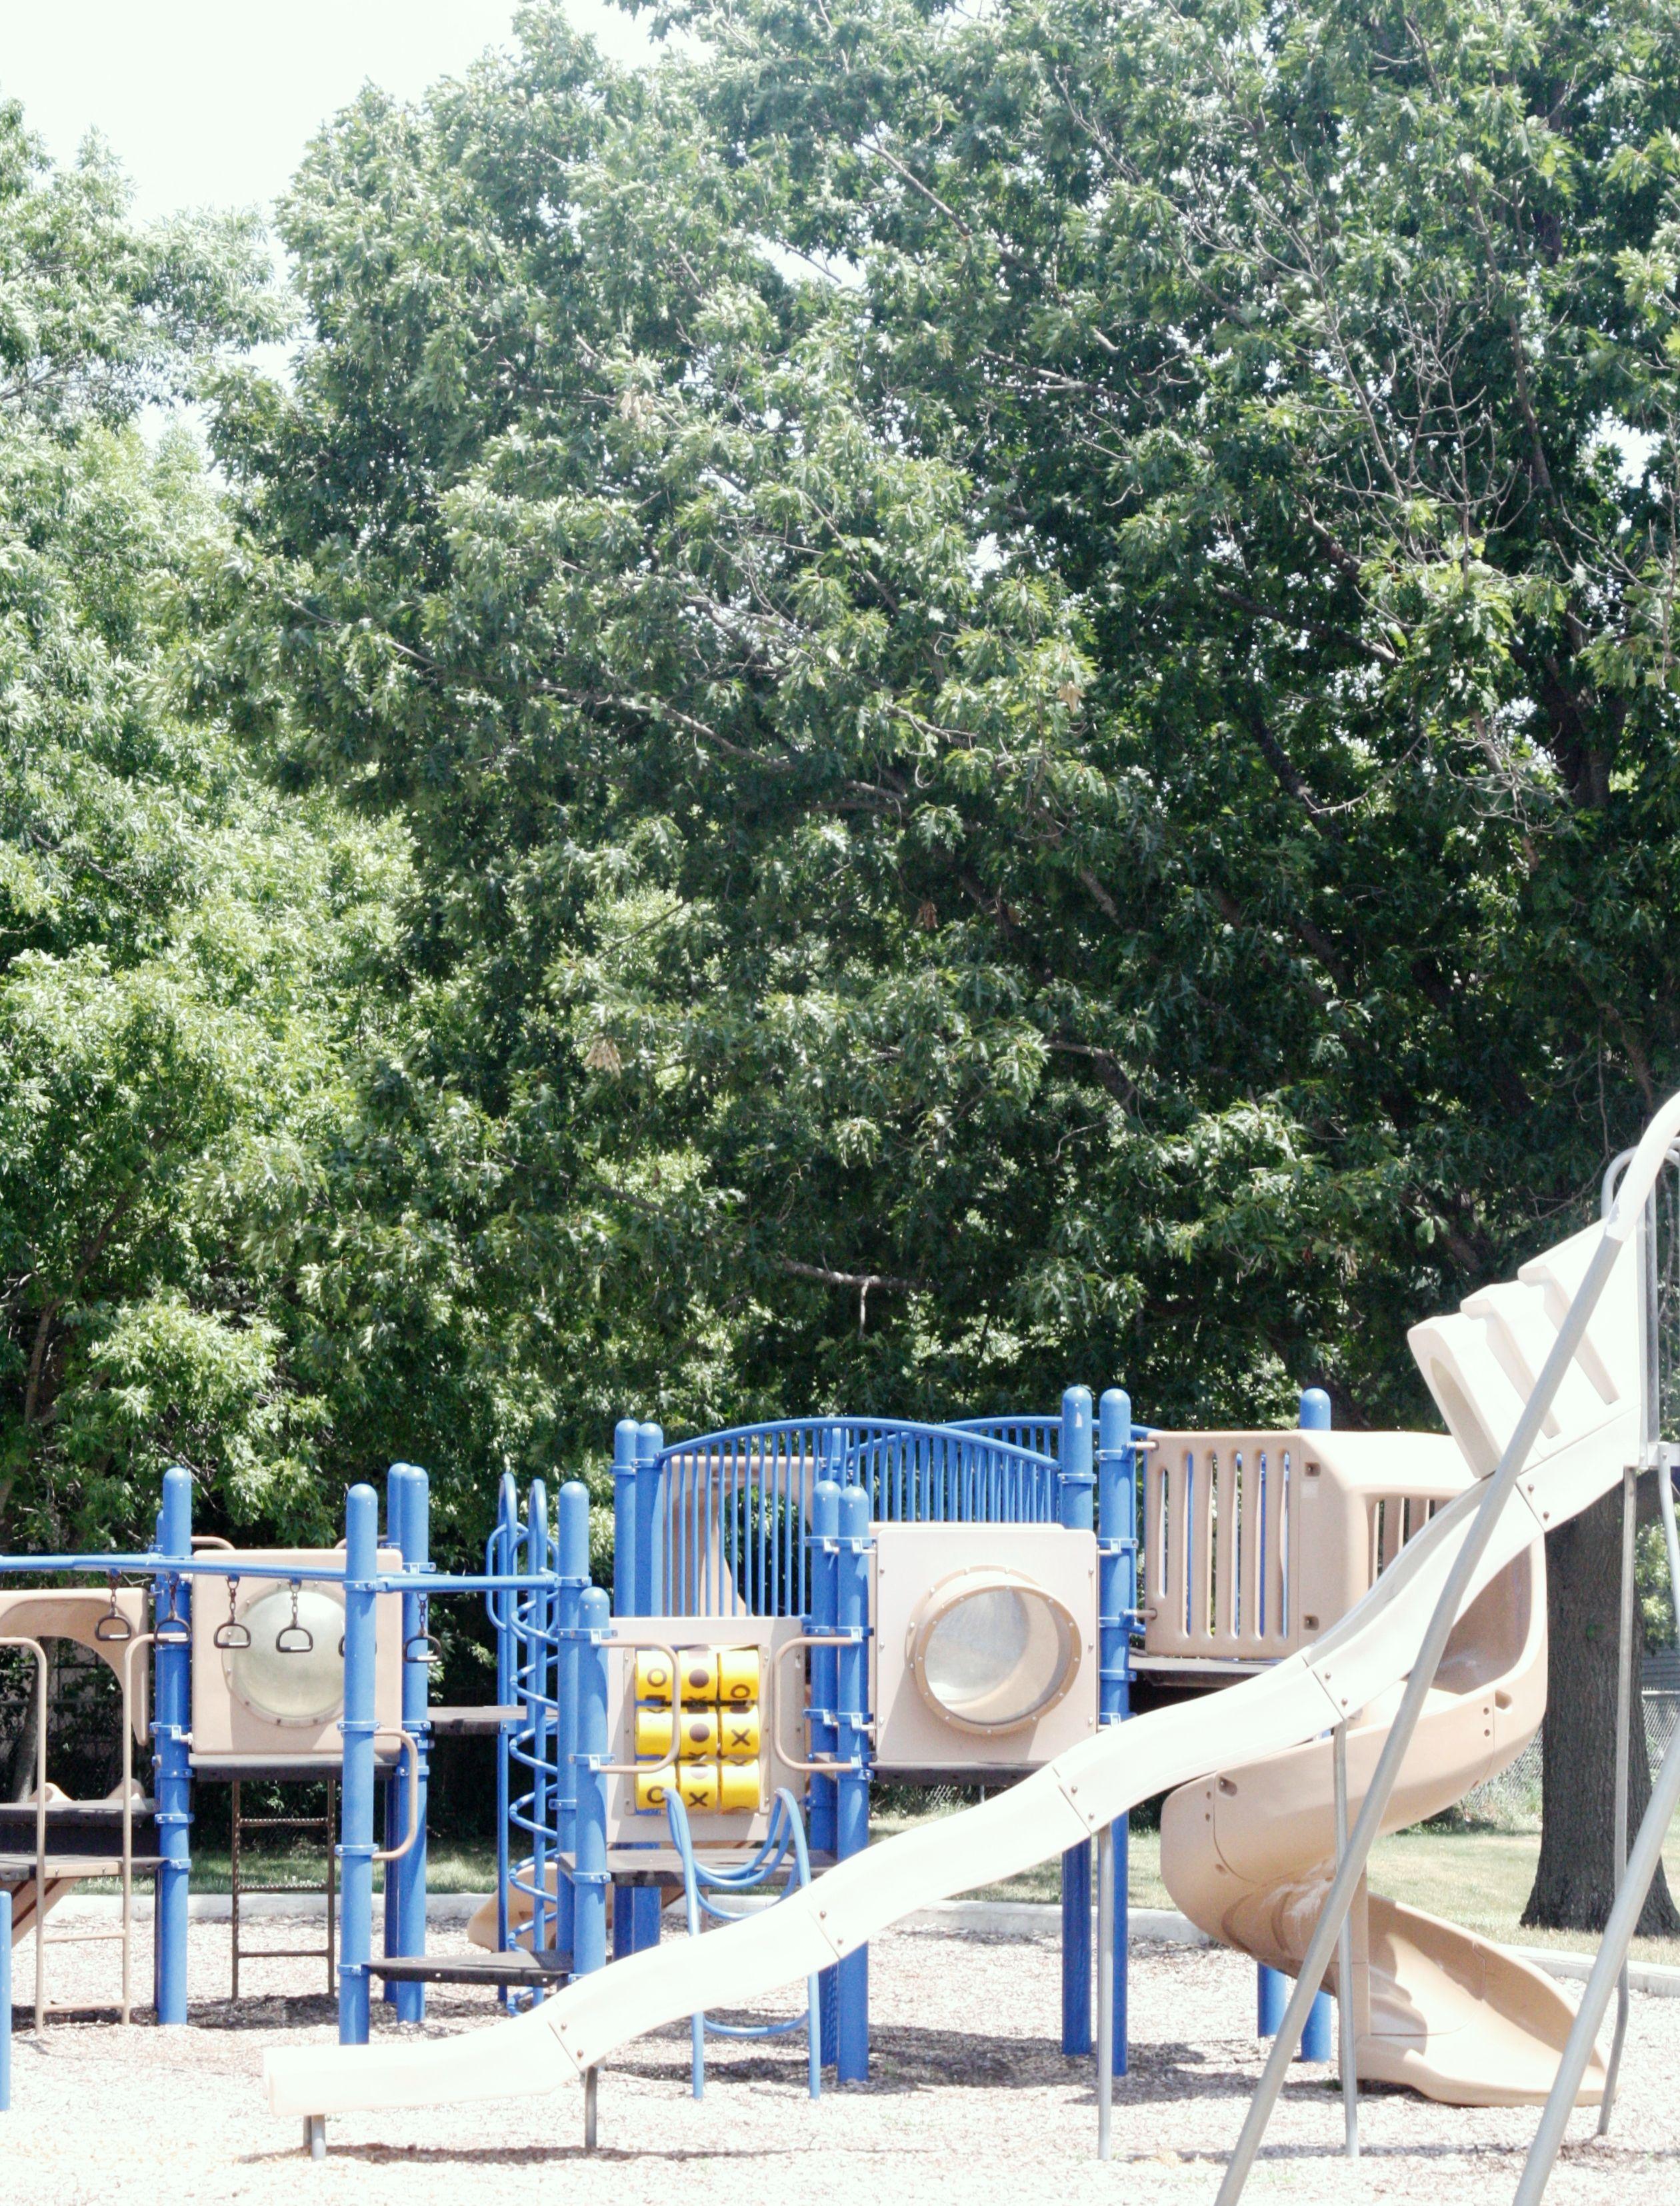 Woodlawn Park Has A Community Garden Playground Equipment Tennis Court Basketball Hoop Picnic Tables And An Open Tennis Court Shade Canopy Basketball Park